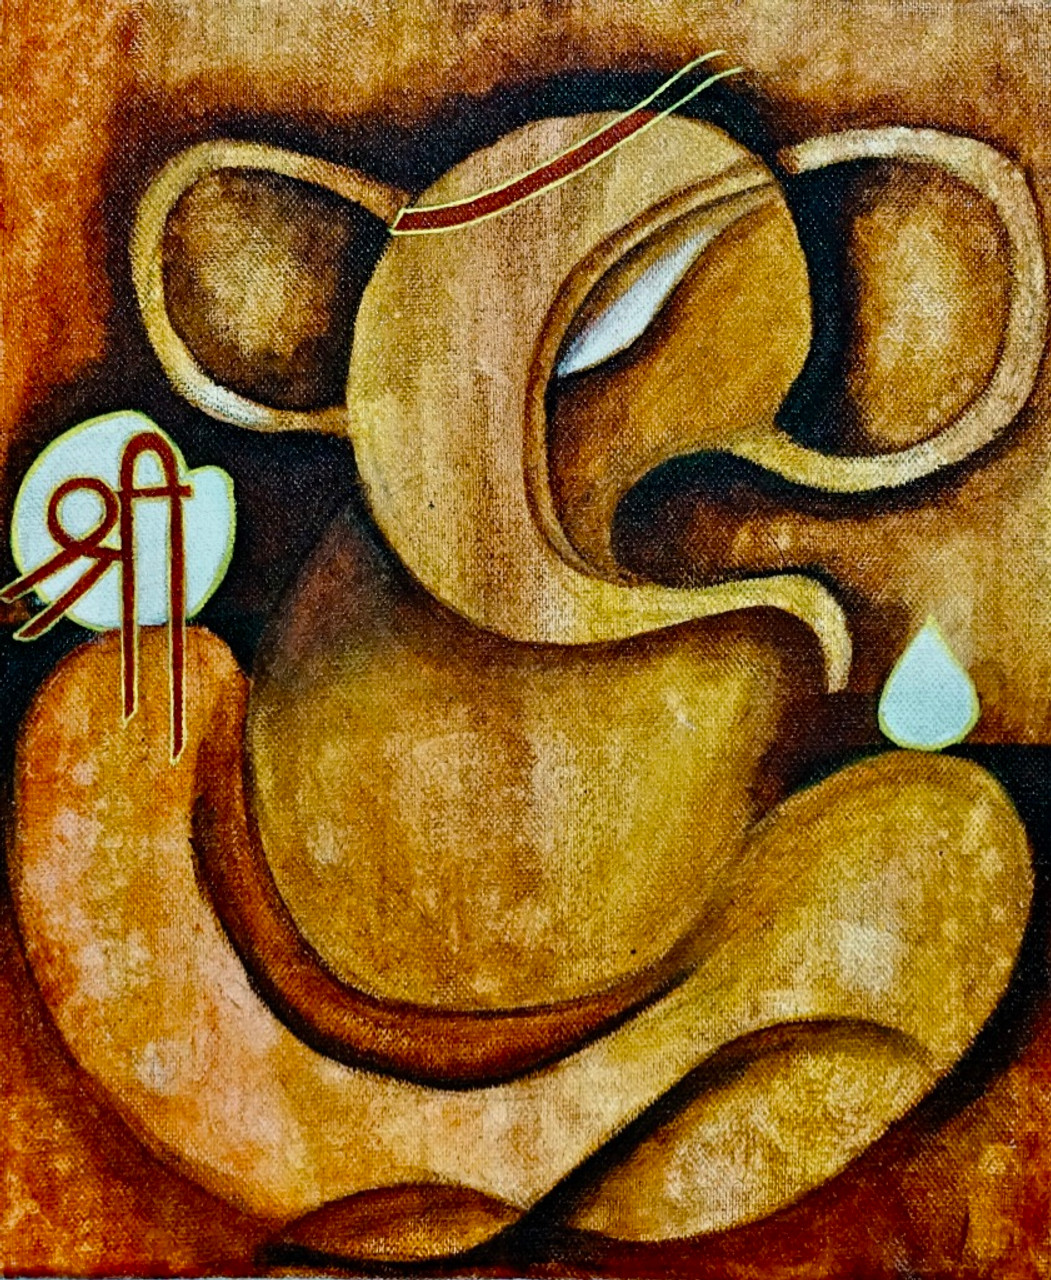 Abstract Ganpati Art 6491 37337 Handpainted Art Painting 10in X 12in Framed